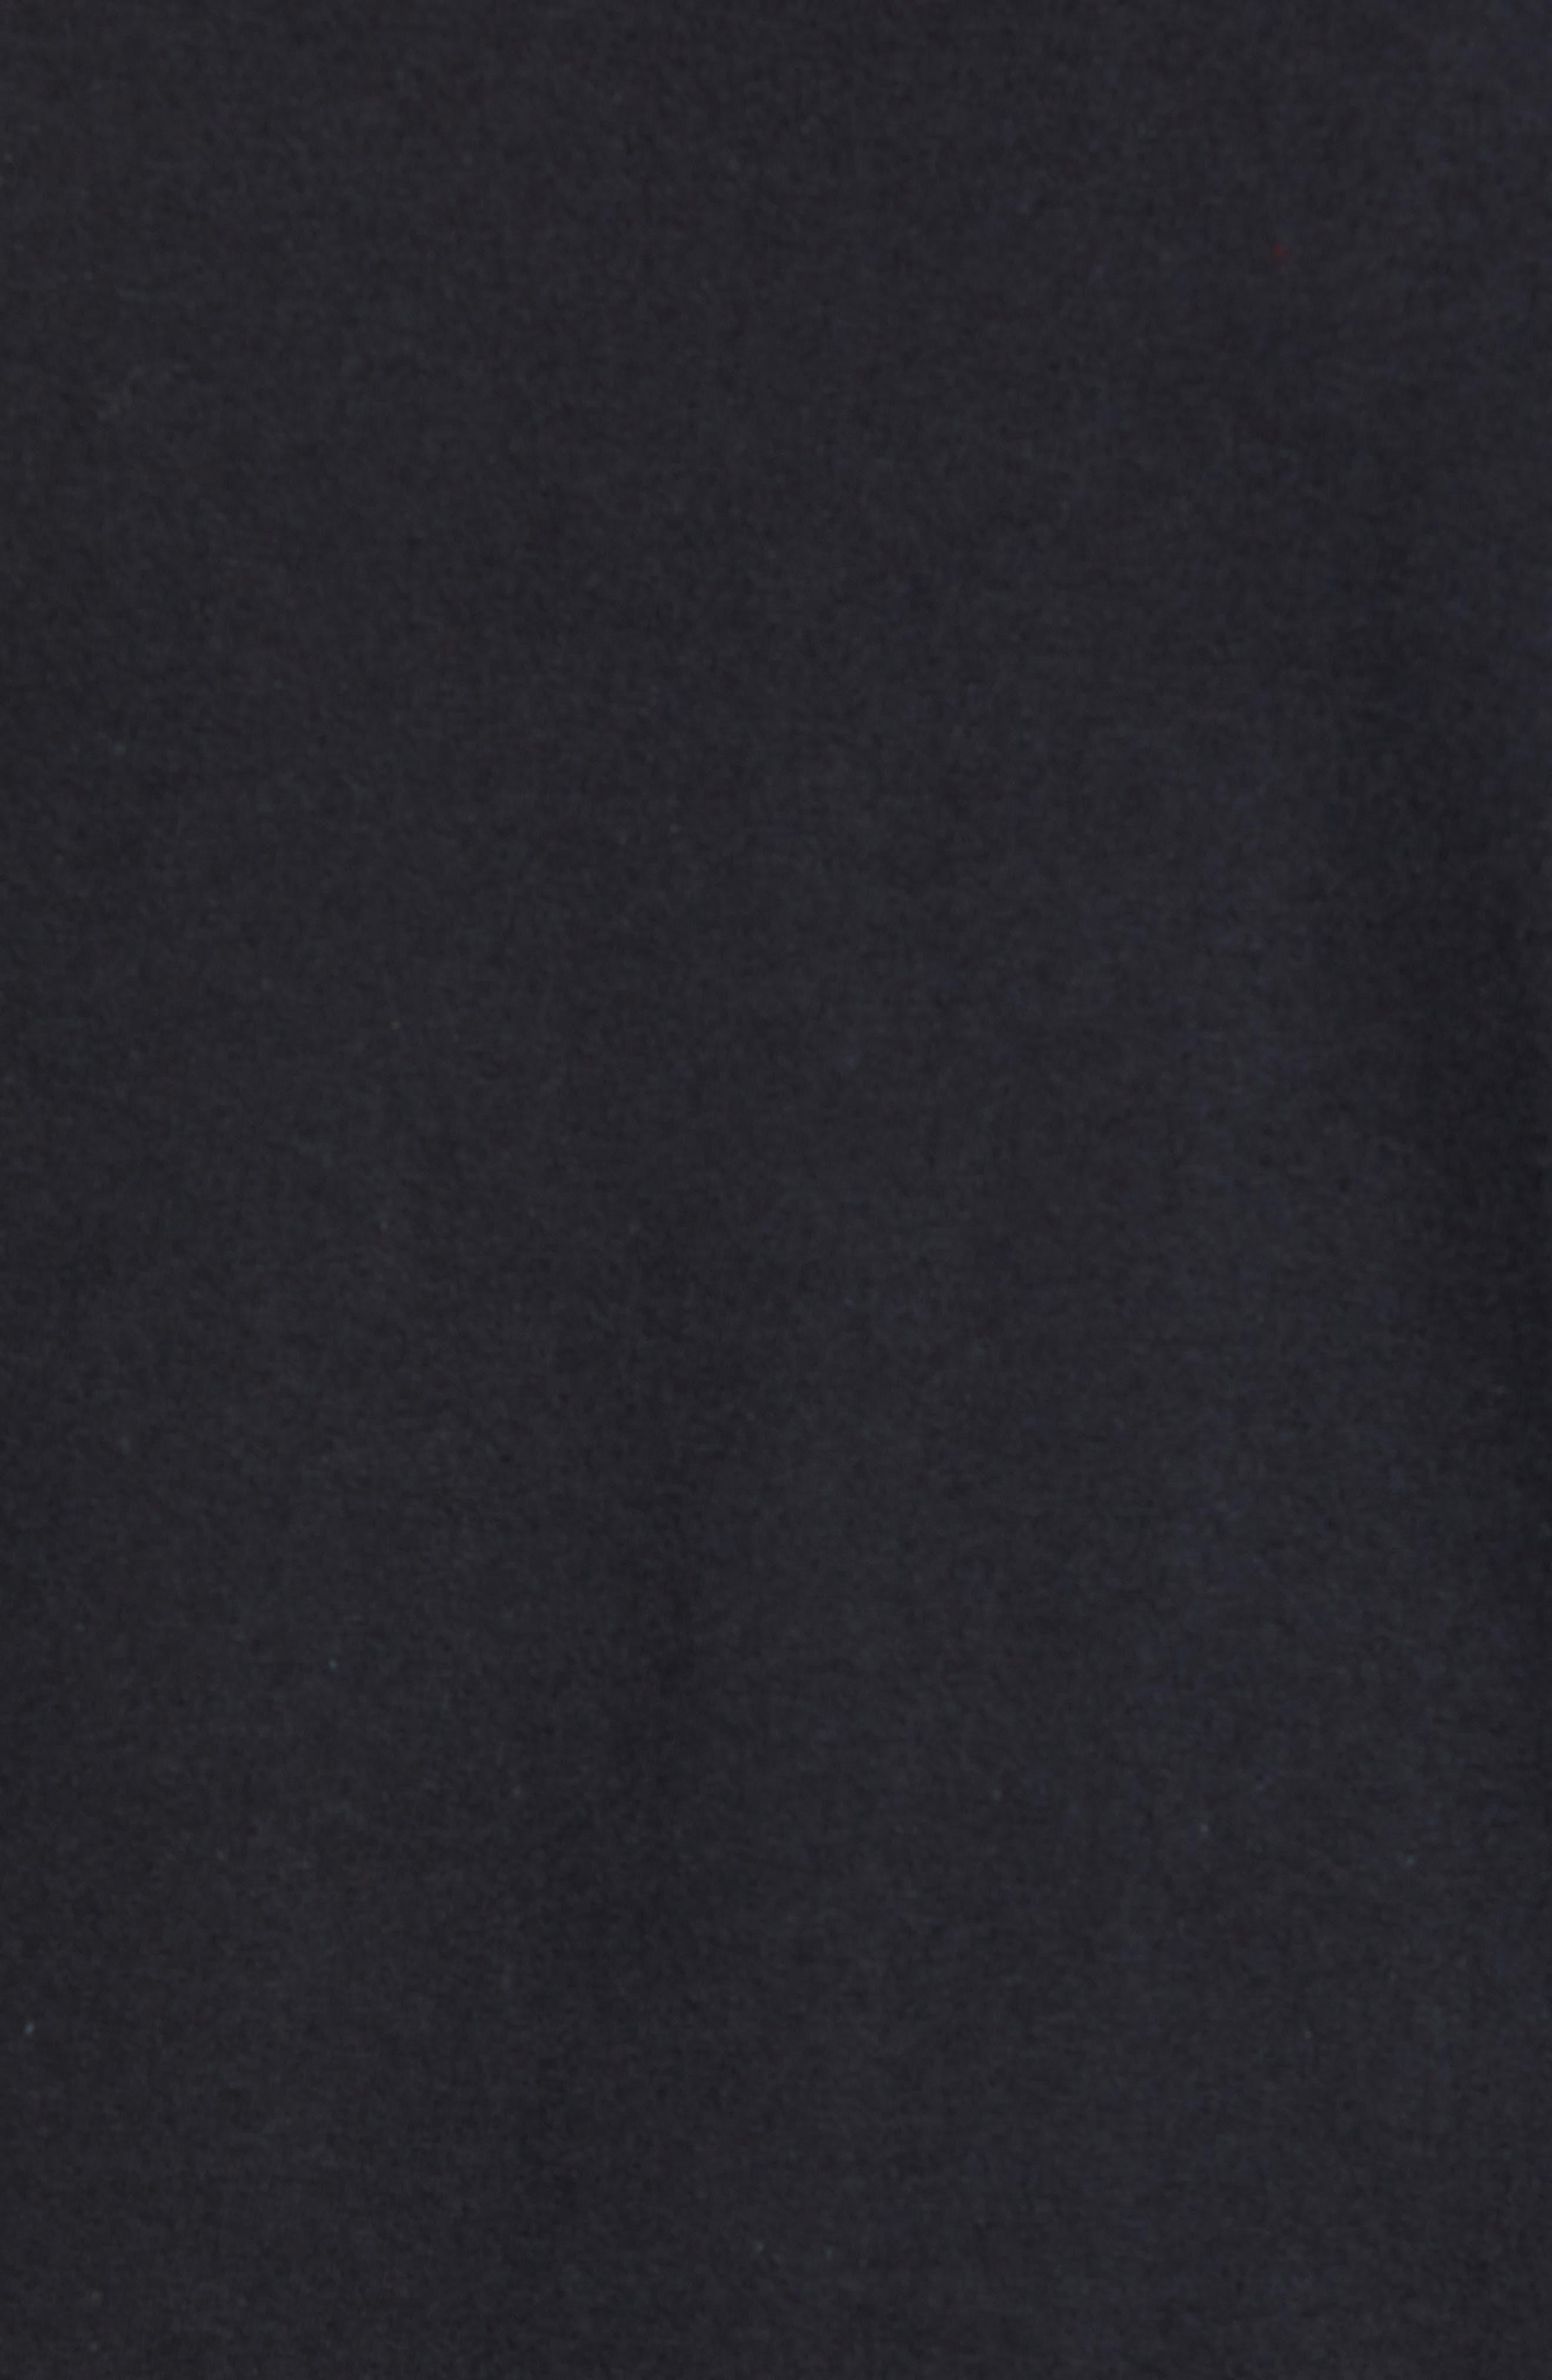 Sportswear More Money T-Shirt,                             Alternate thumbnail 5, color,                             Black/ Metallic Silver